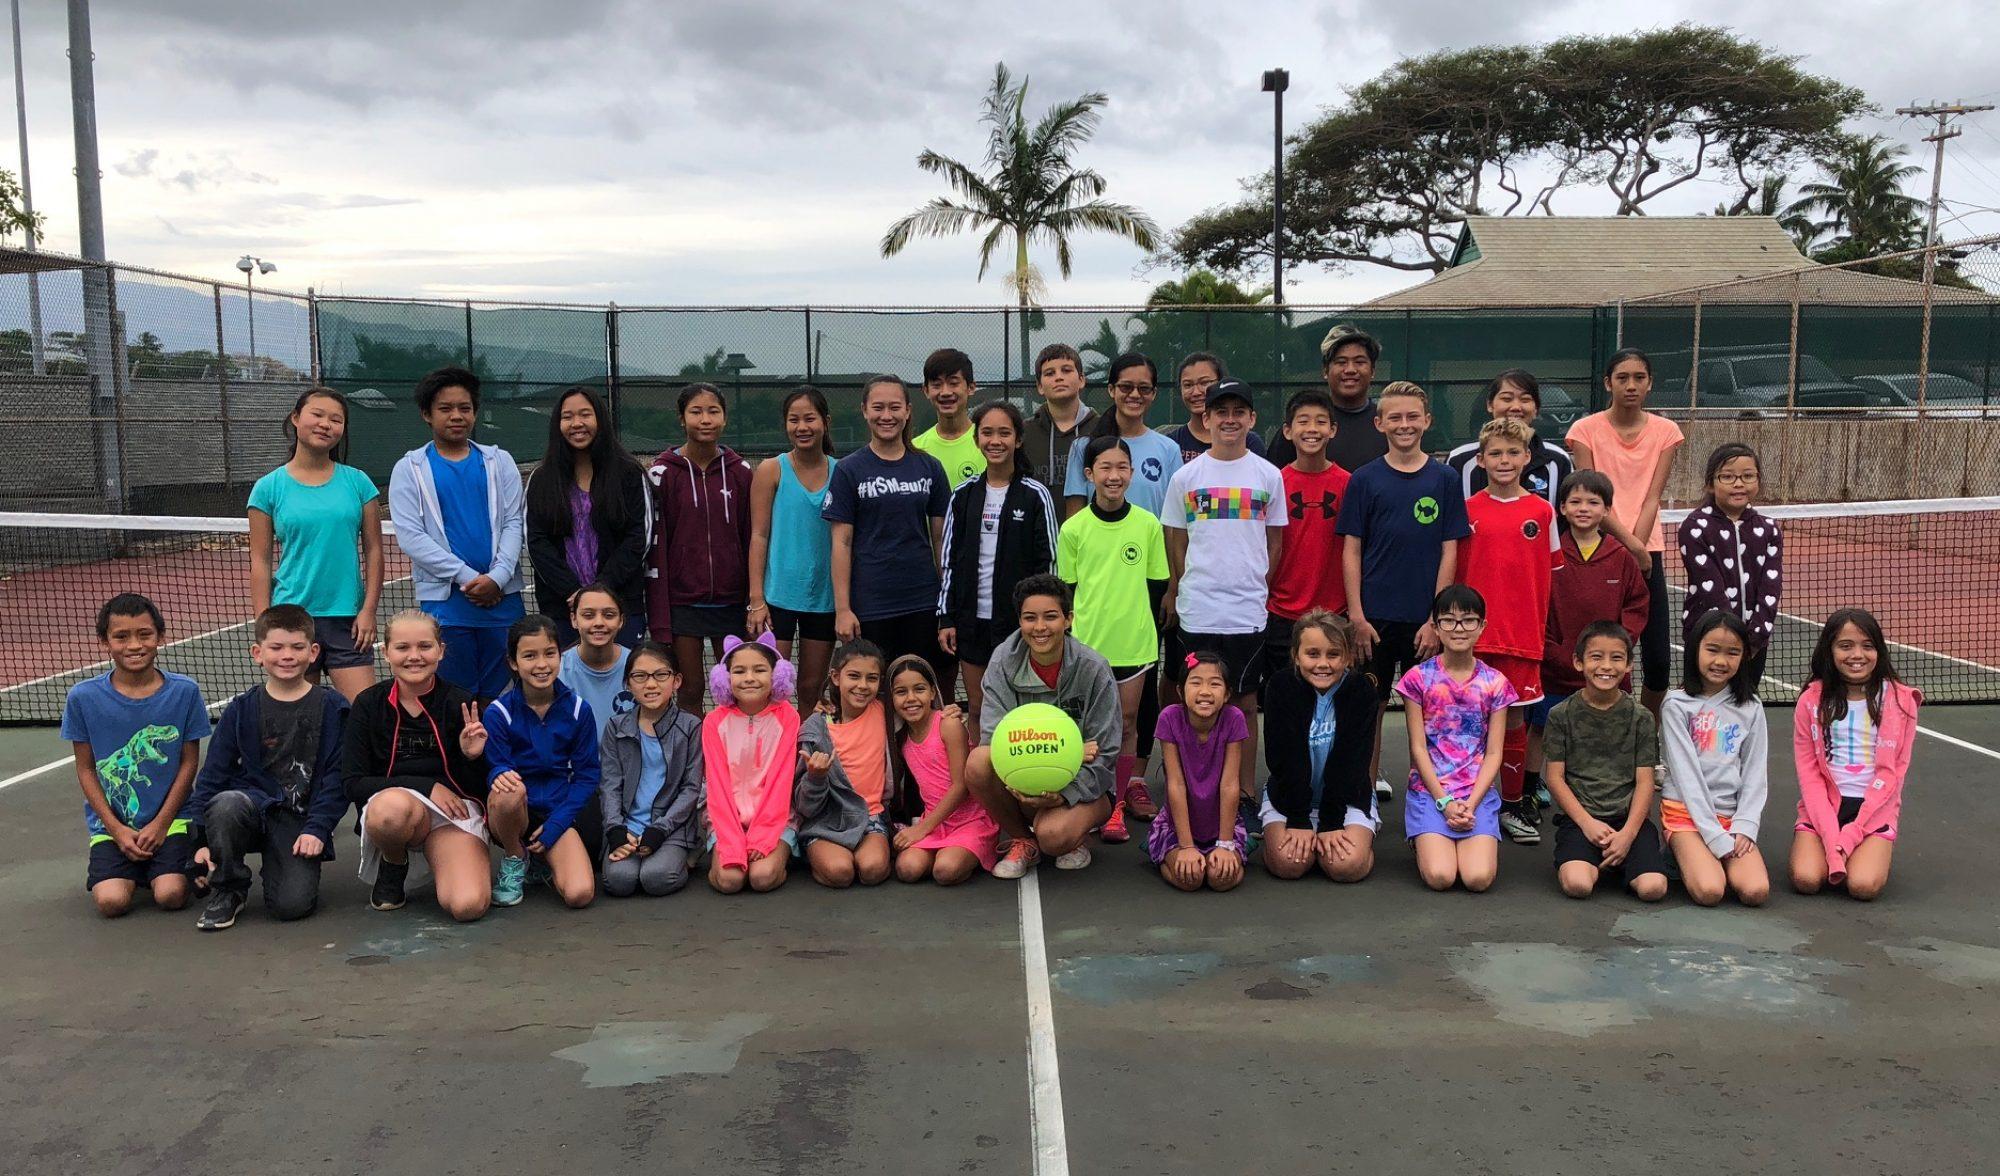 Wailuku Junior Tennis Club